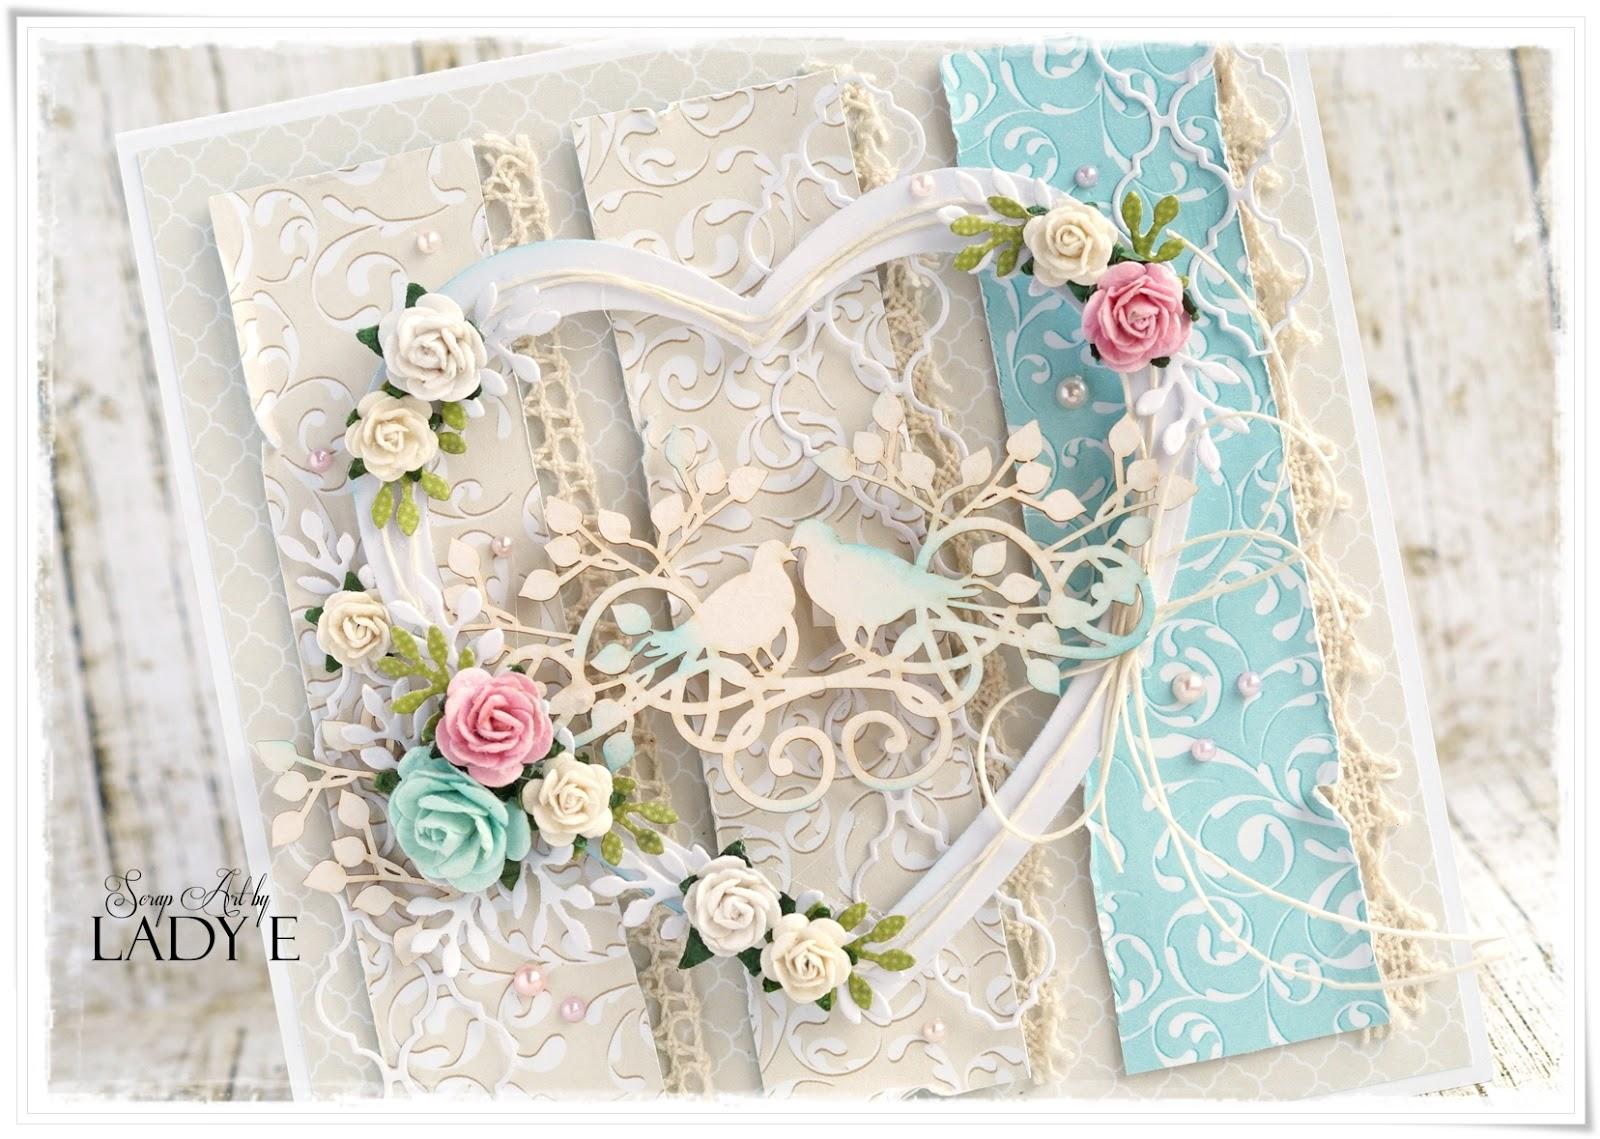 Wild Orchid Crafts 2 Wedding Anniversary Cards